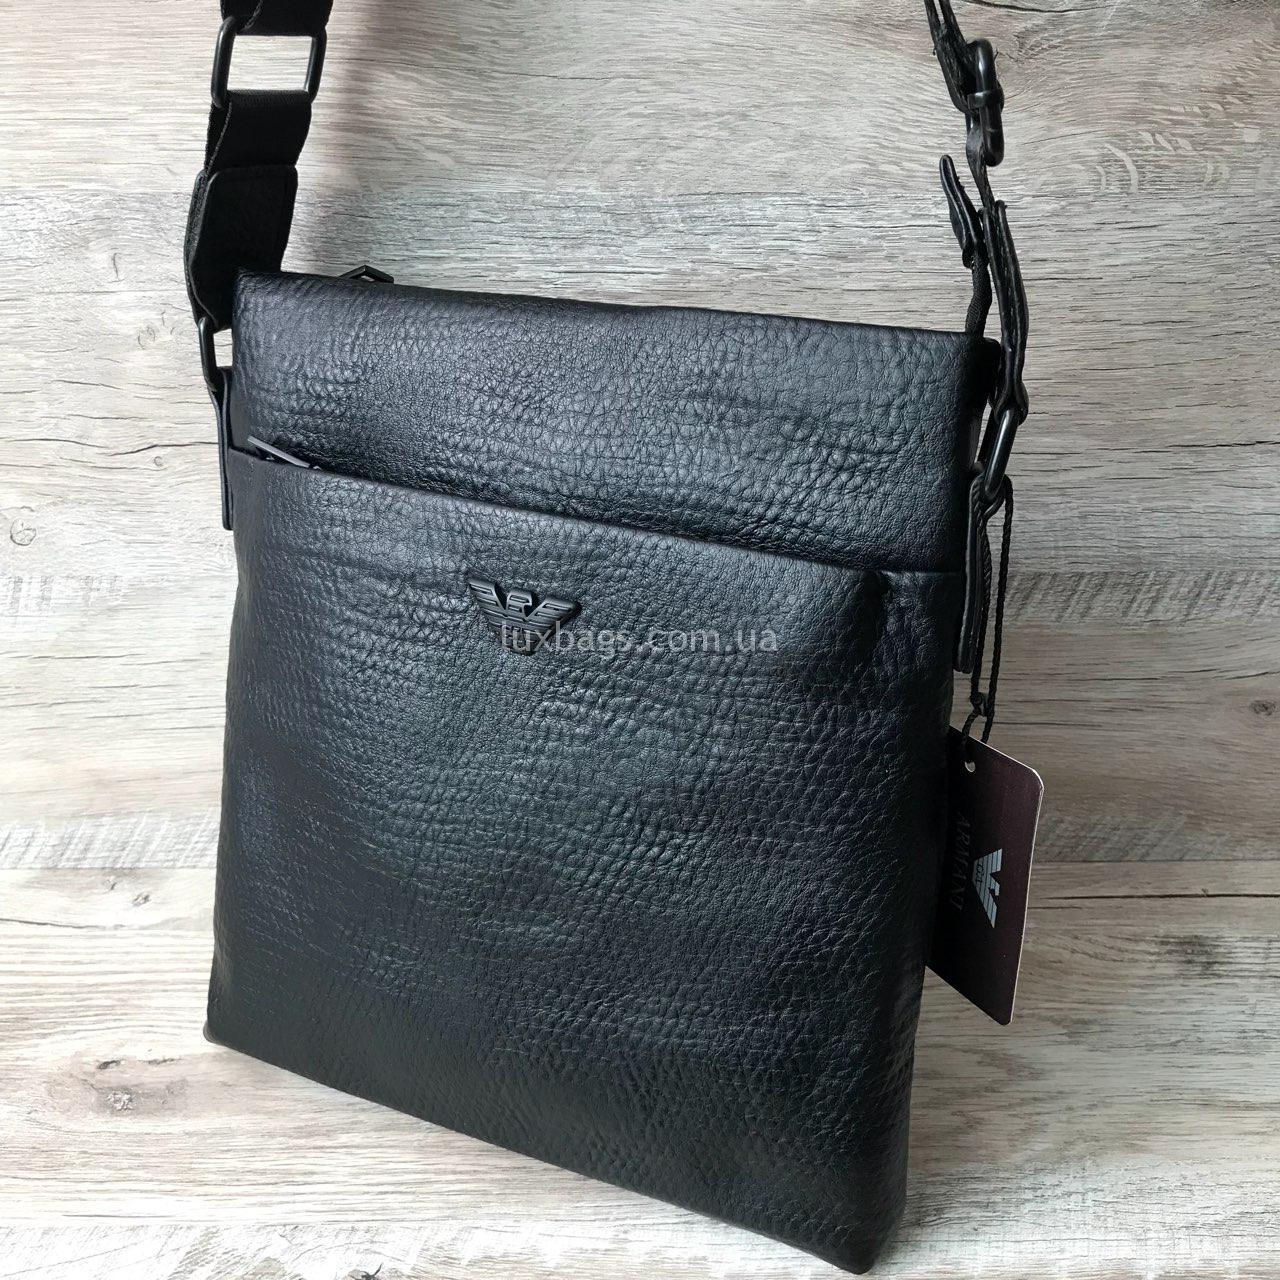 3170dde9933e Мужская сумка Armani (Армани) через плечо Купить Недорого